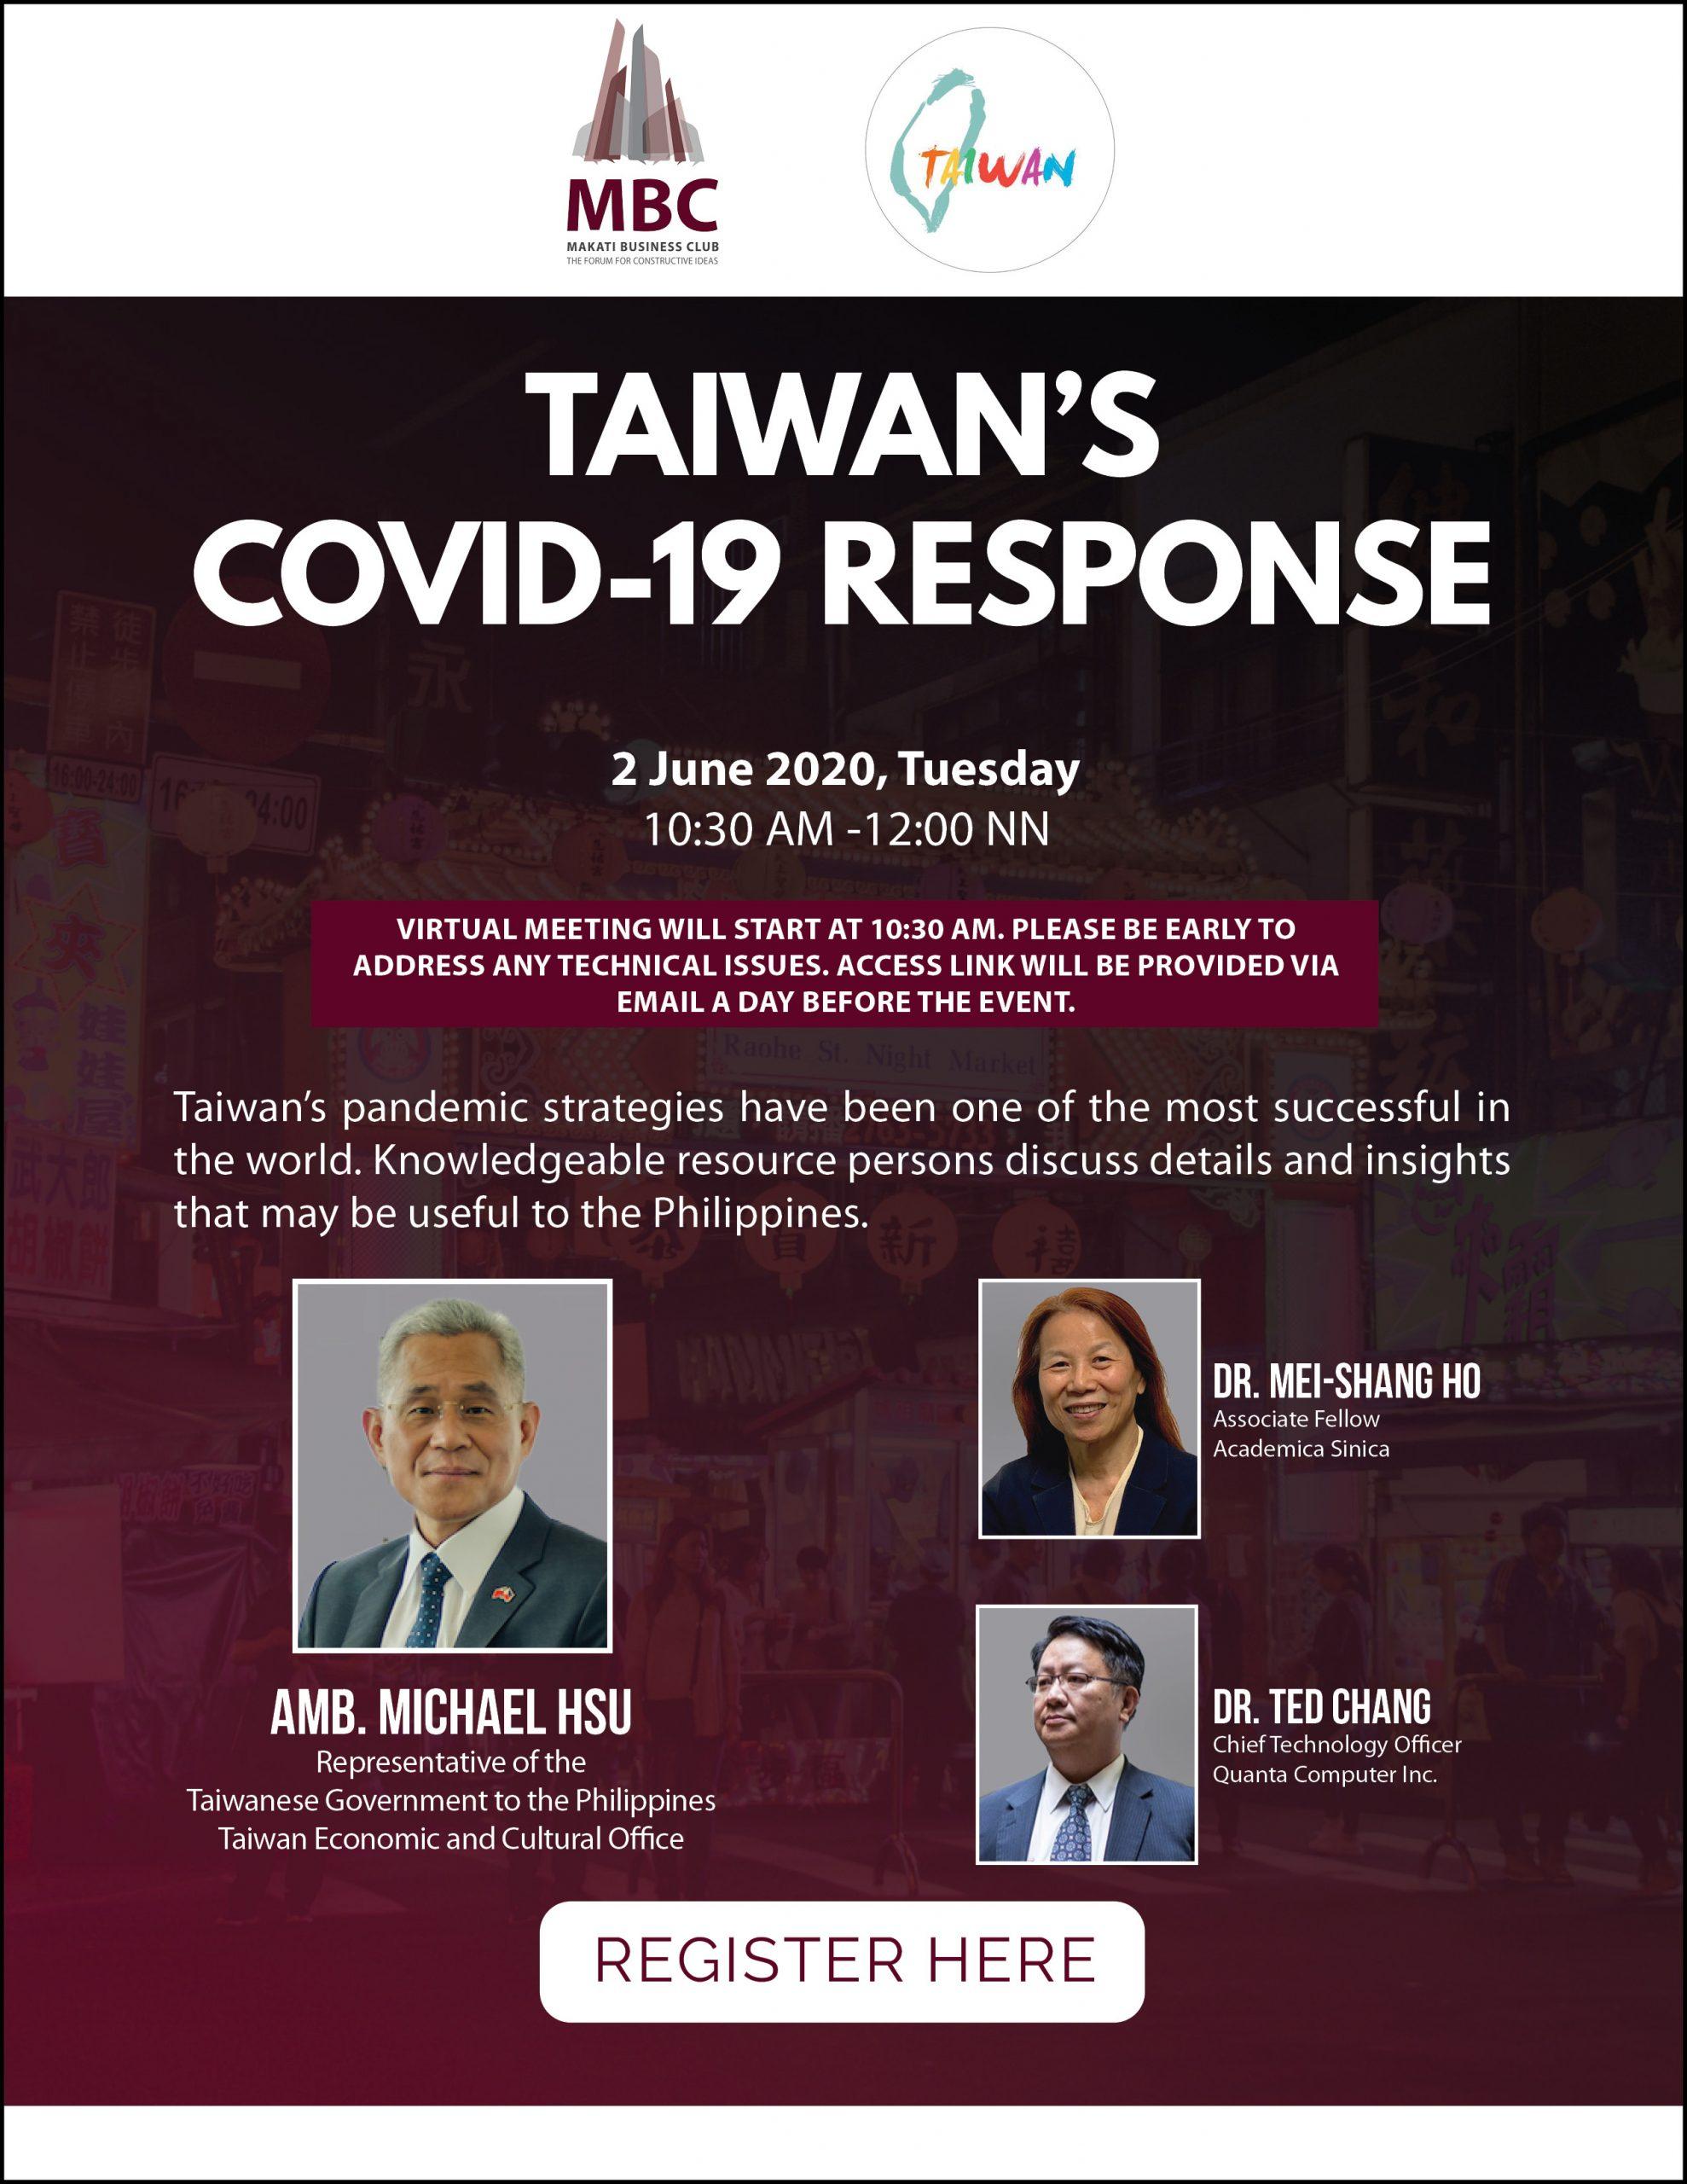 Taiwan's COVID-19 Response